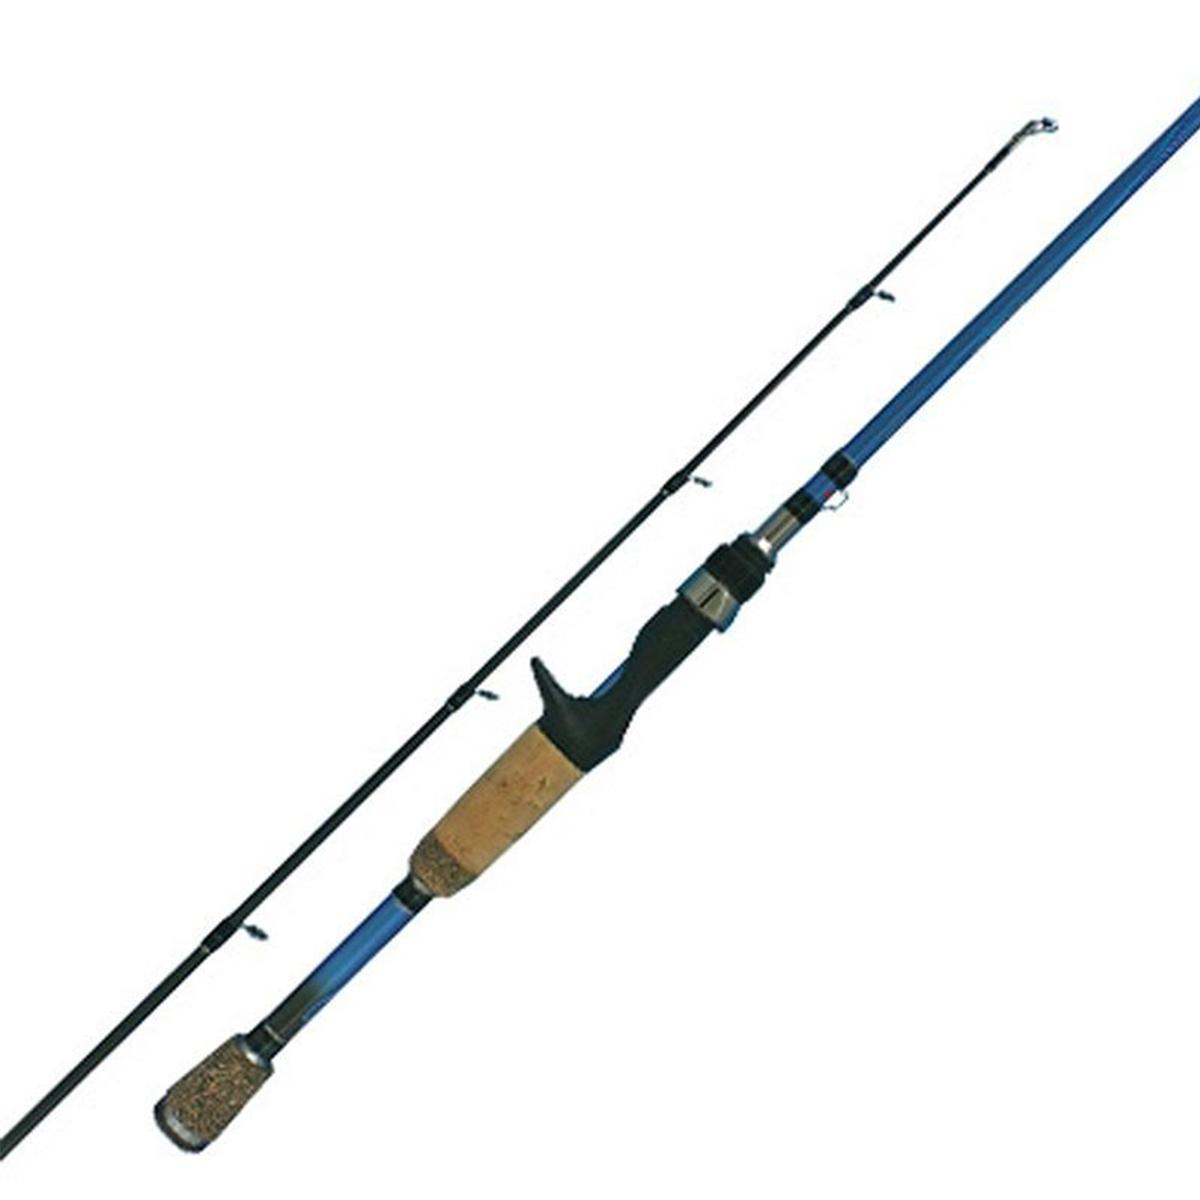 Vara para Carretilha Plusfish Assault 1,68m 6-14lb Branco/Vermelho